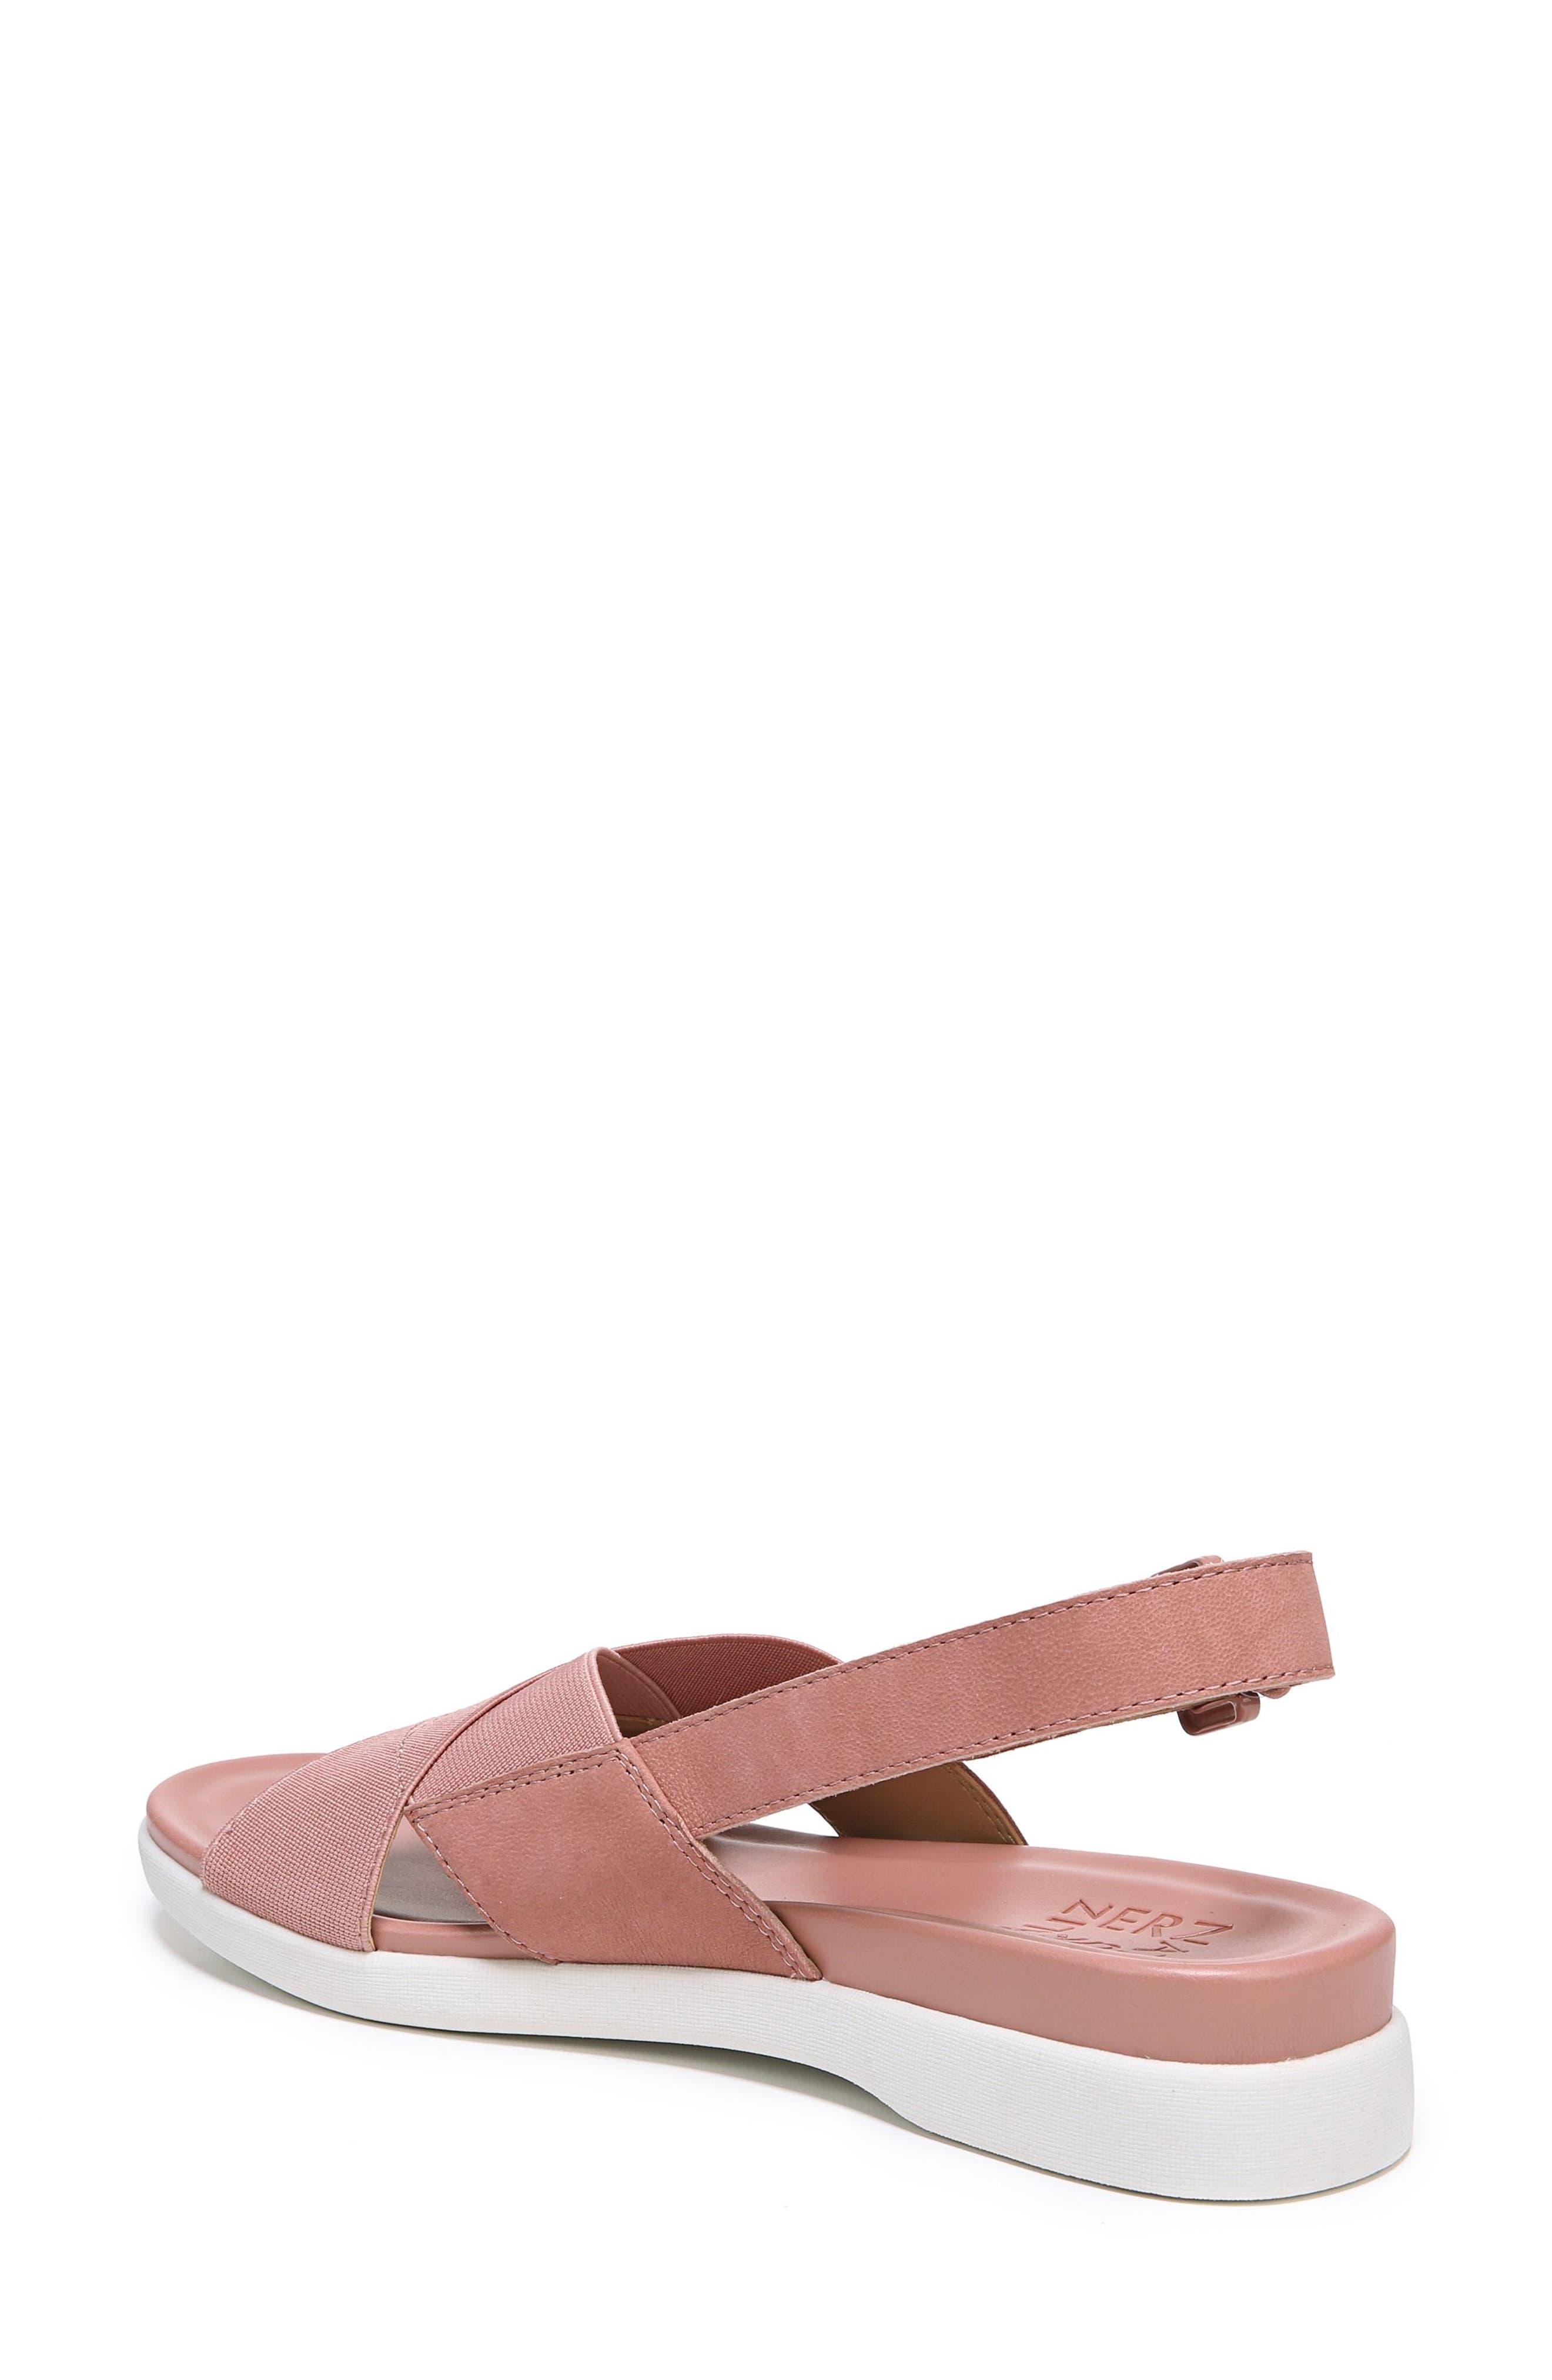 Eliza Wedge Sandal,                             Alternate thumbnail 2, color,                             Pink Nubuck Leather